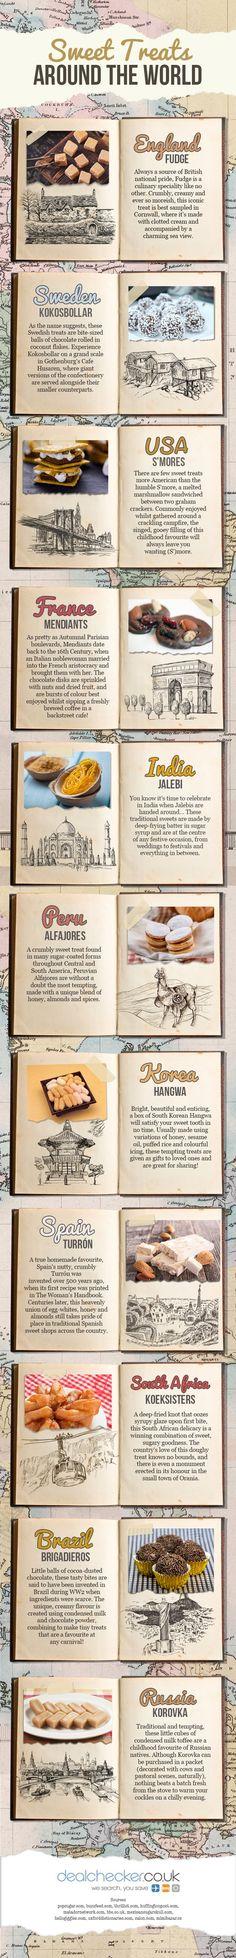 Sweet Treats Around the World #infographic #Travel #Food